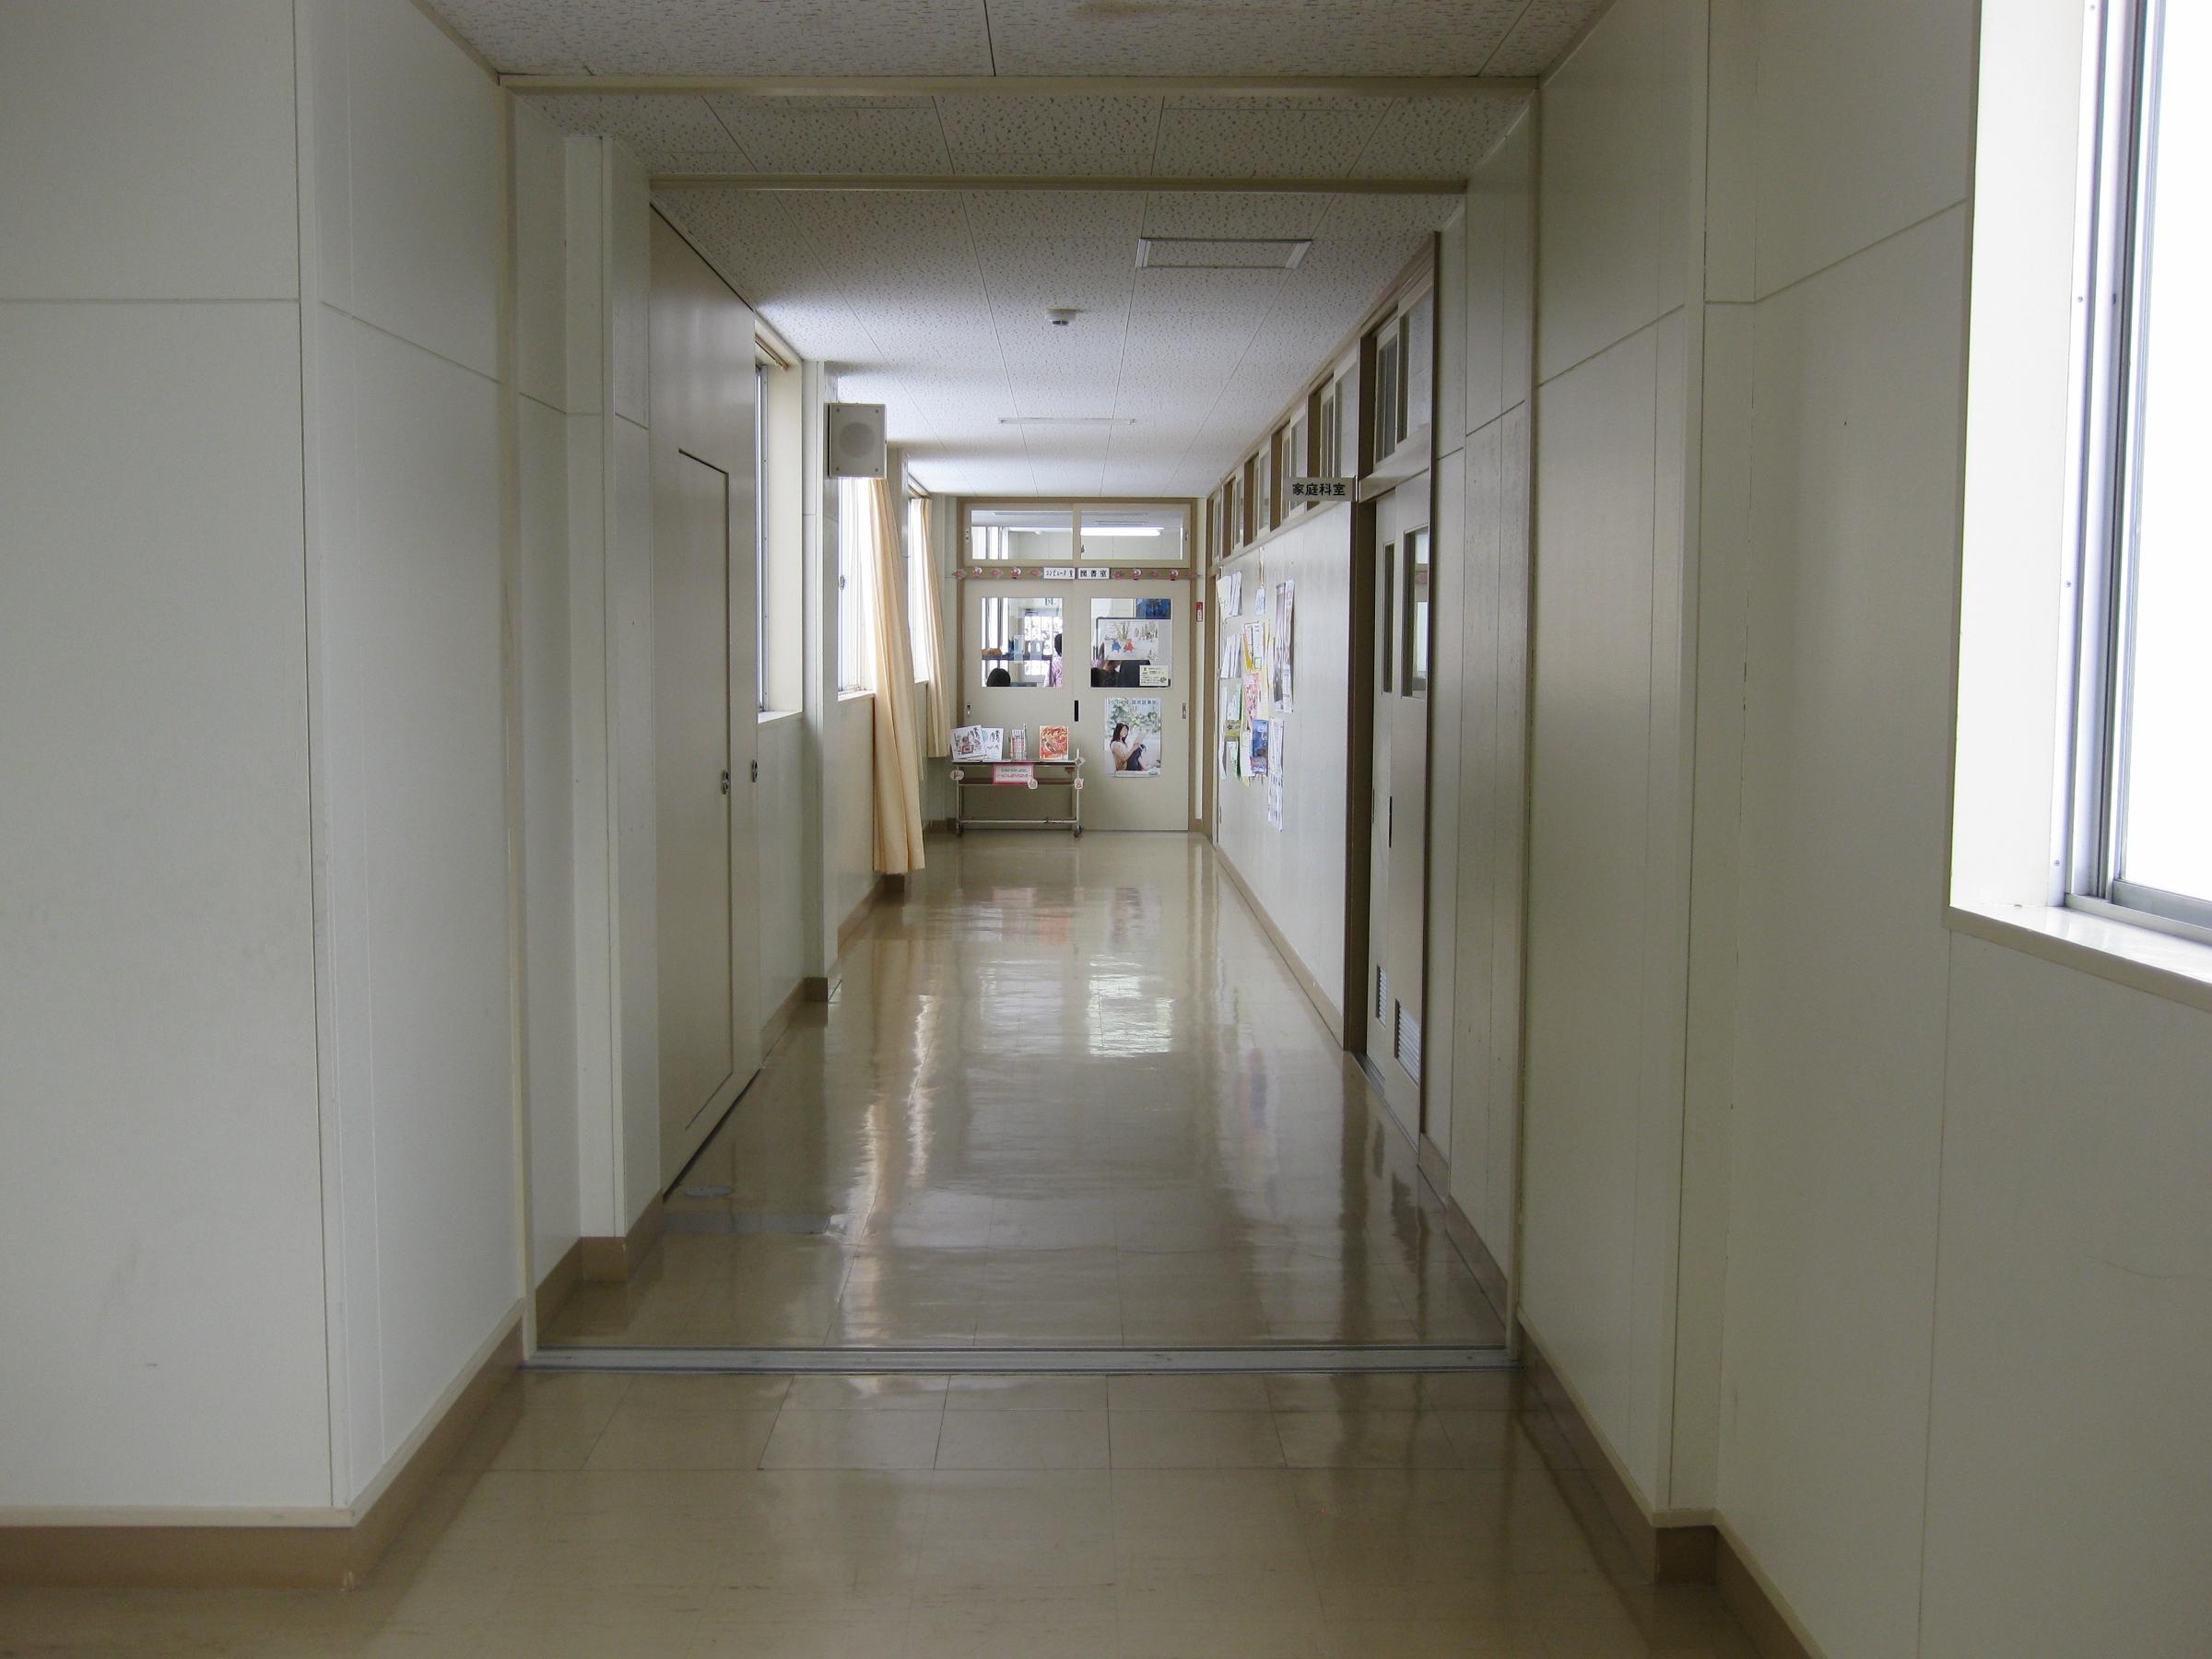 File:Hitane Elementary School hallway 4.jpg - Wikimedia ...